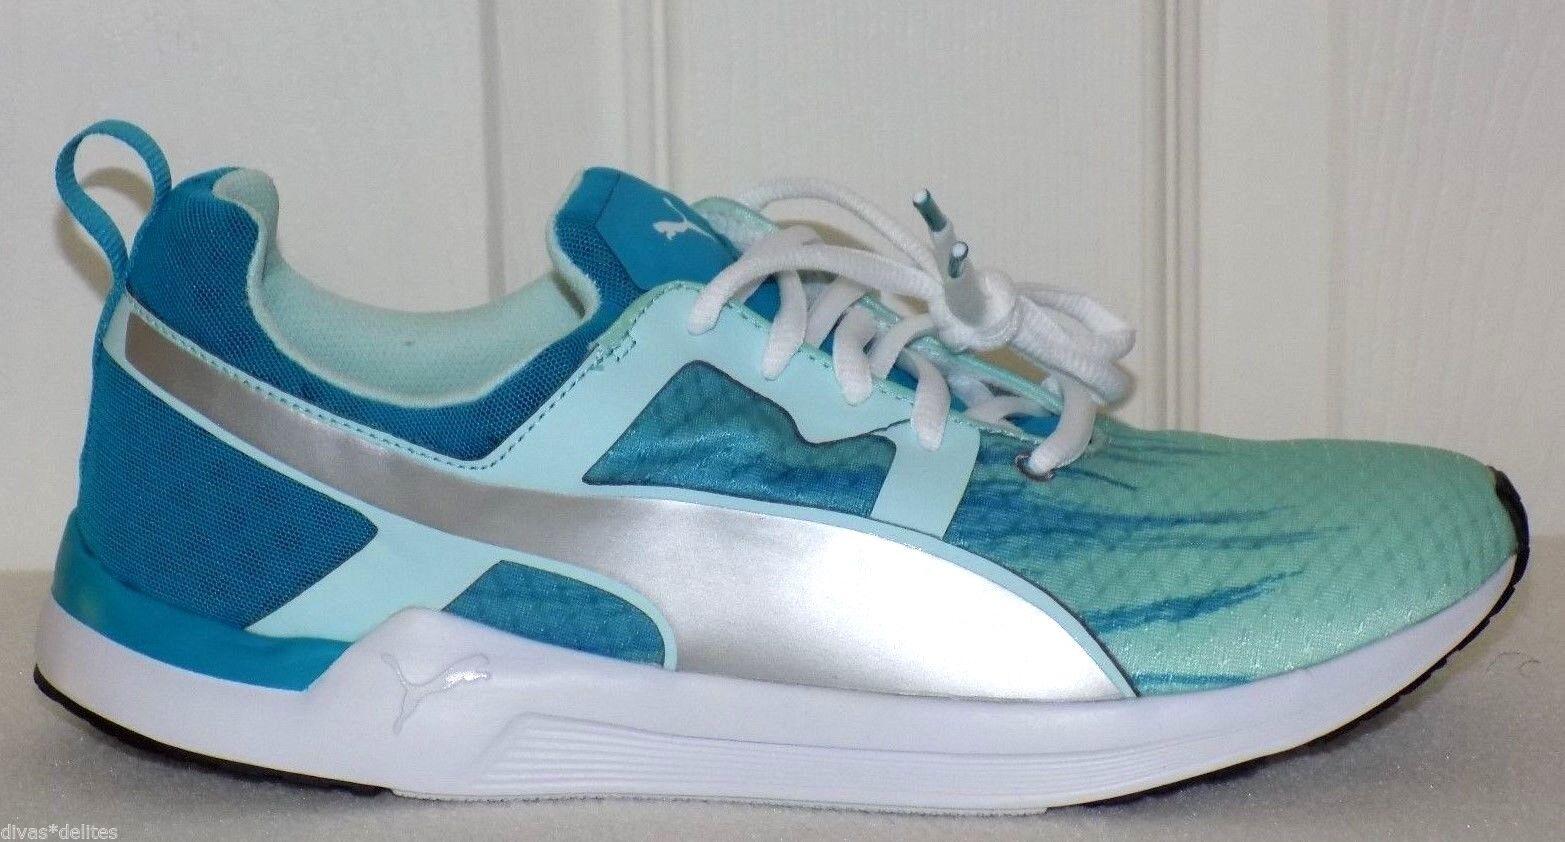 Women's Puma XT Fade Cross Trainer Sneakers  Style: 188755 03 Comfortable Seasonal price cuts, discount benefits